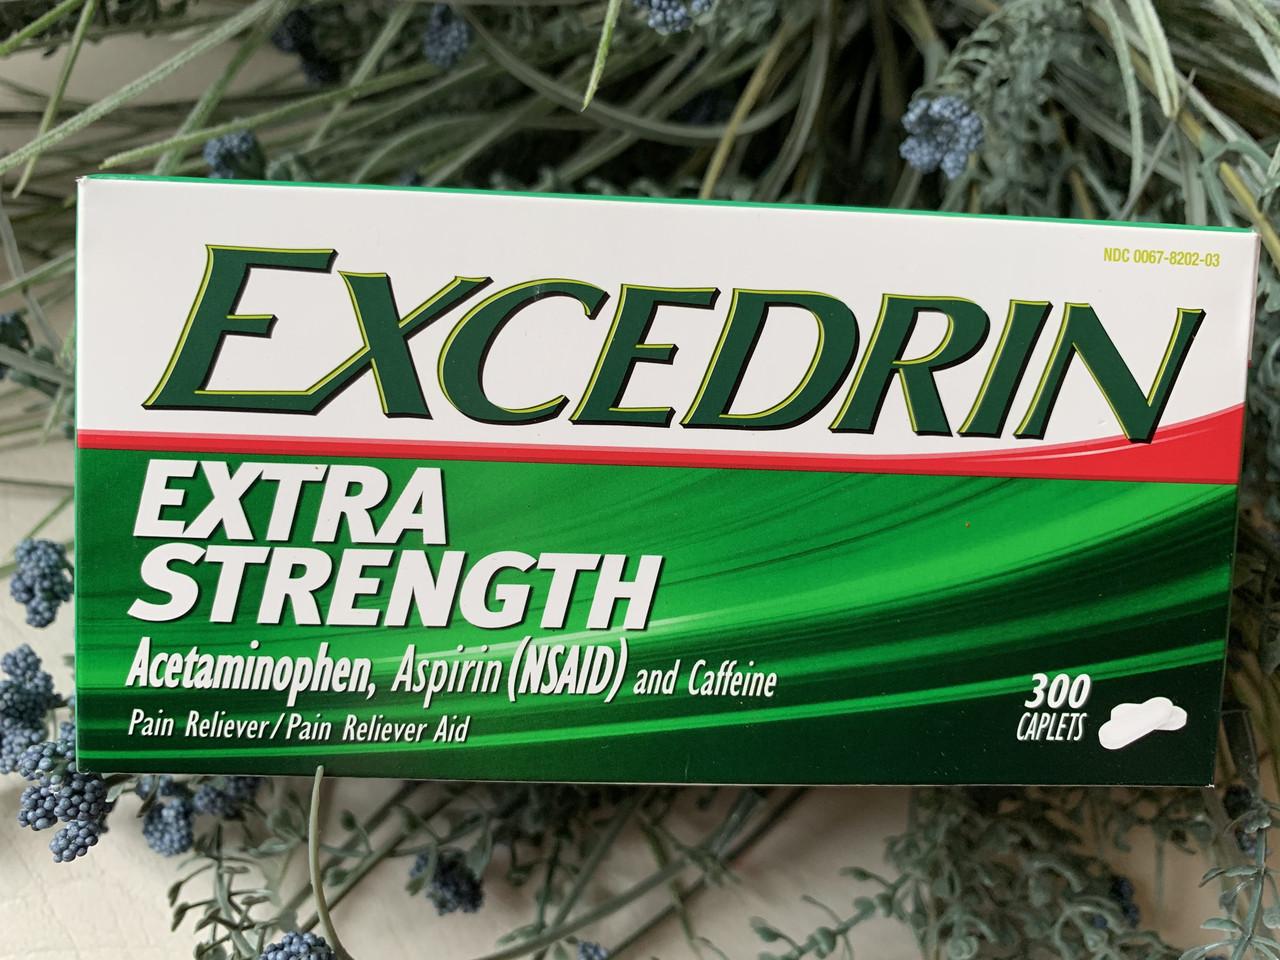 Препарат от мигрени Excedrin Extra Strength, 300штук